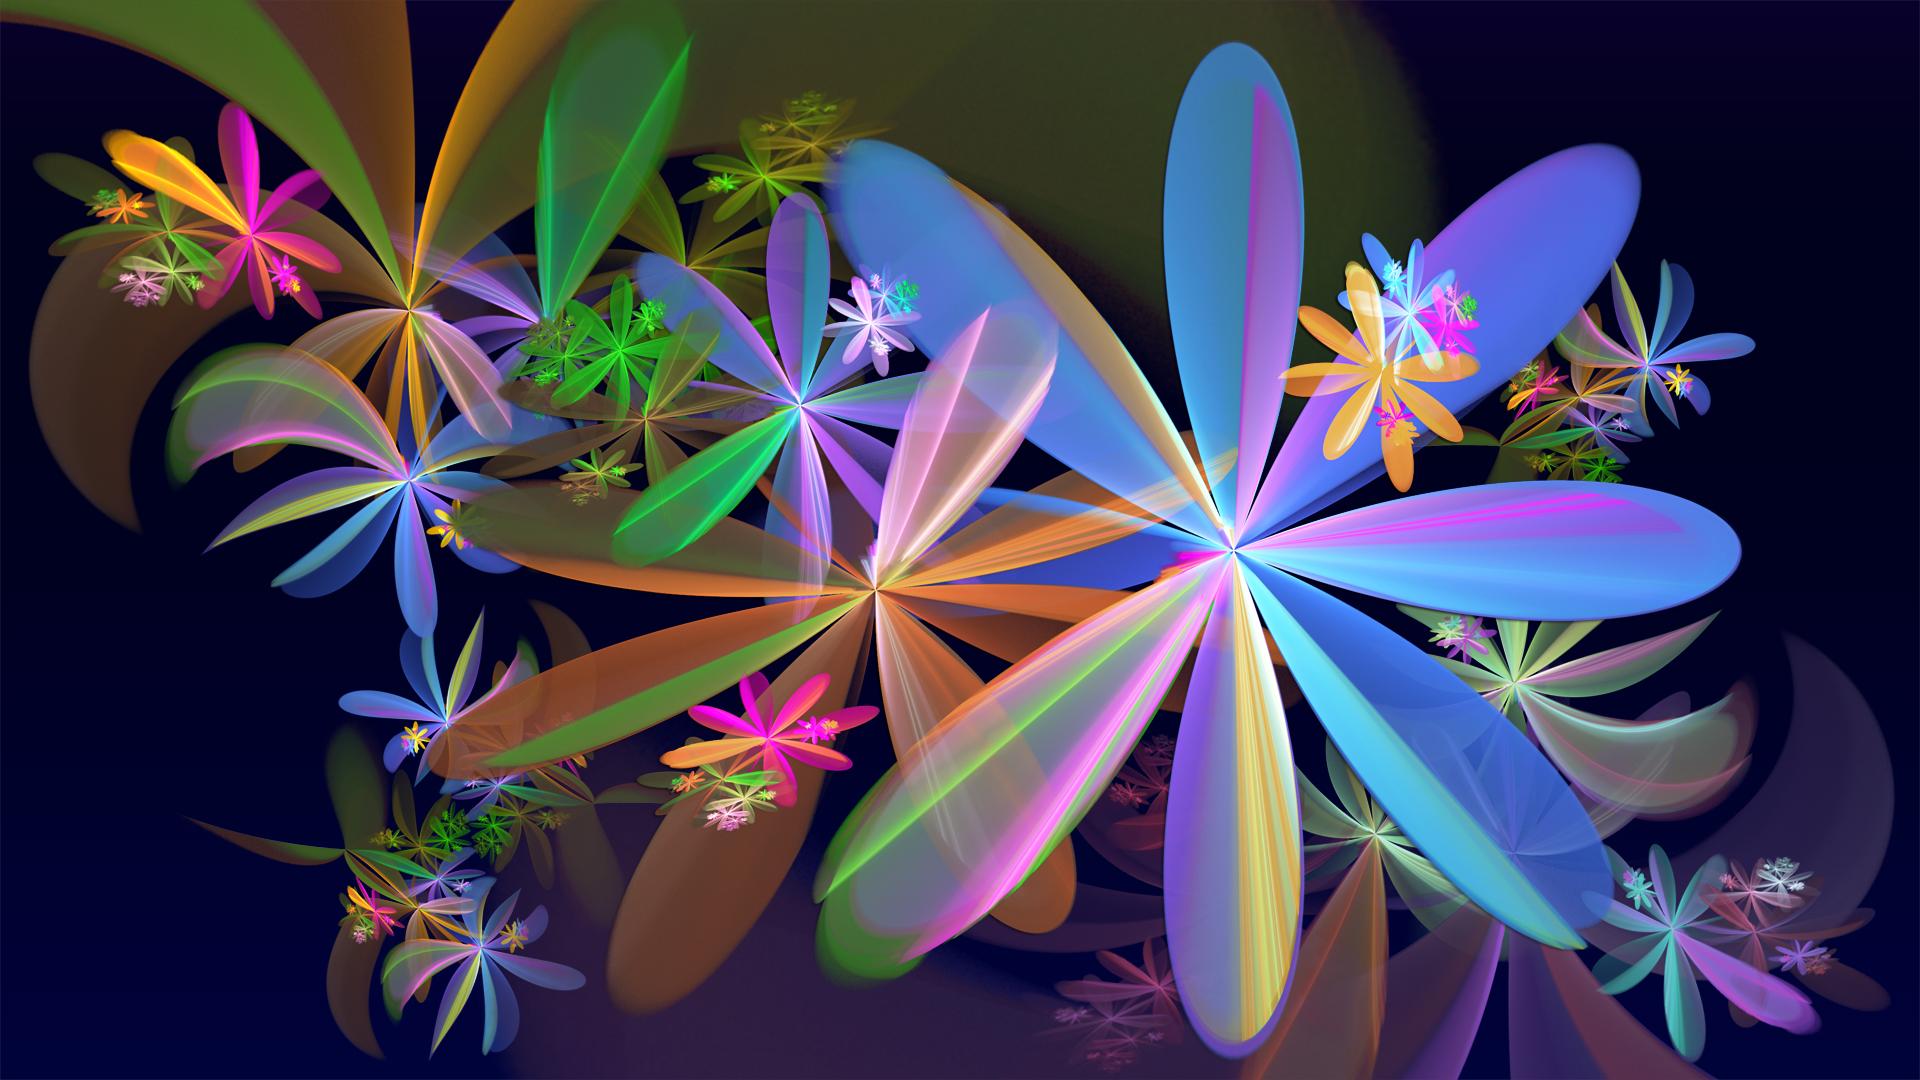 Image Logonstudio Screensavers Explore Little Daisies Crazy Wallpaper ...